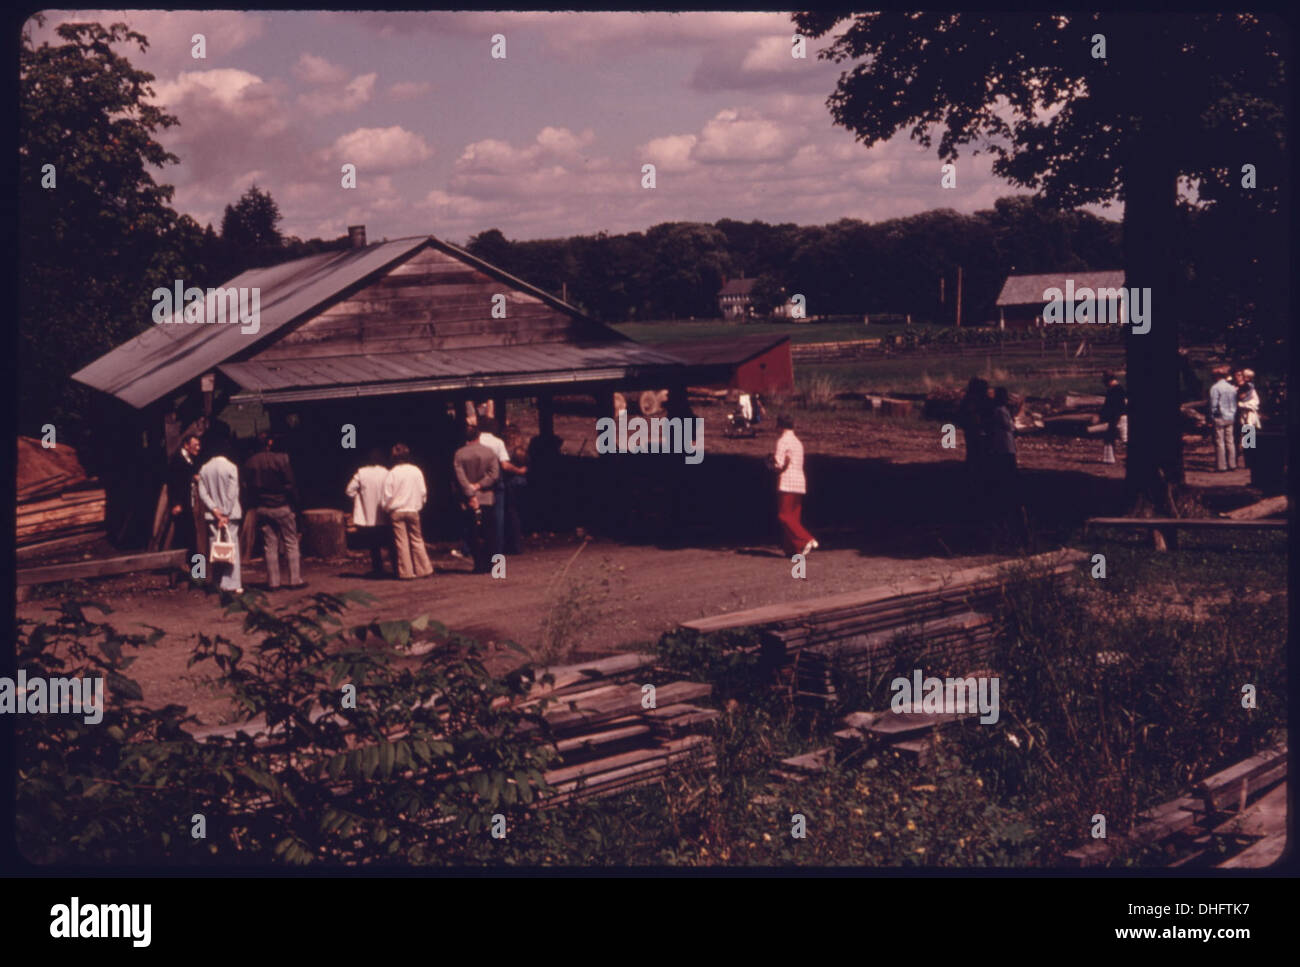 Sawmill Farm Stock Photos & Sawmill Farm Stock Images - Page 2 - Alamy